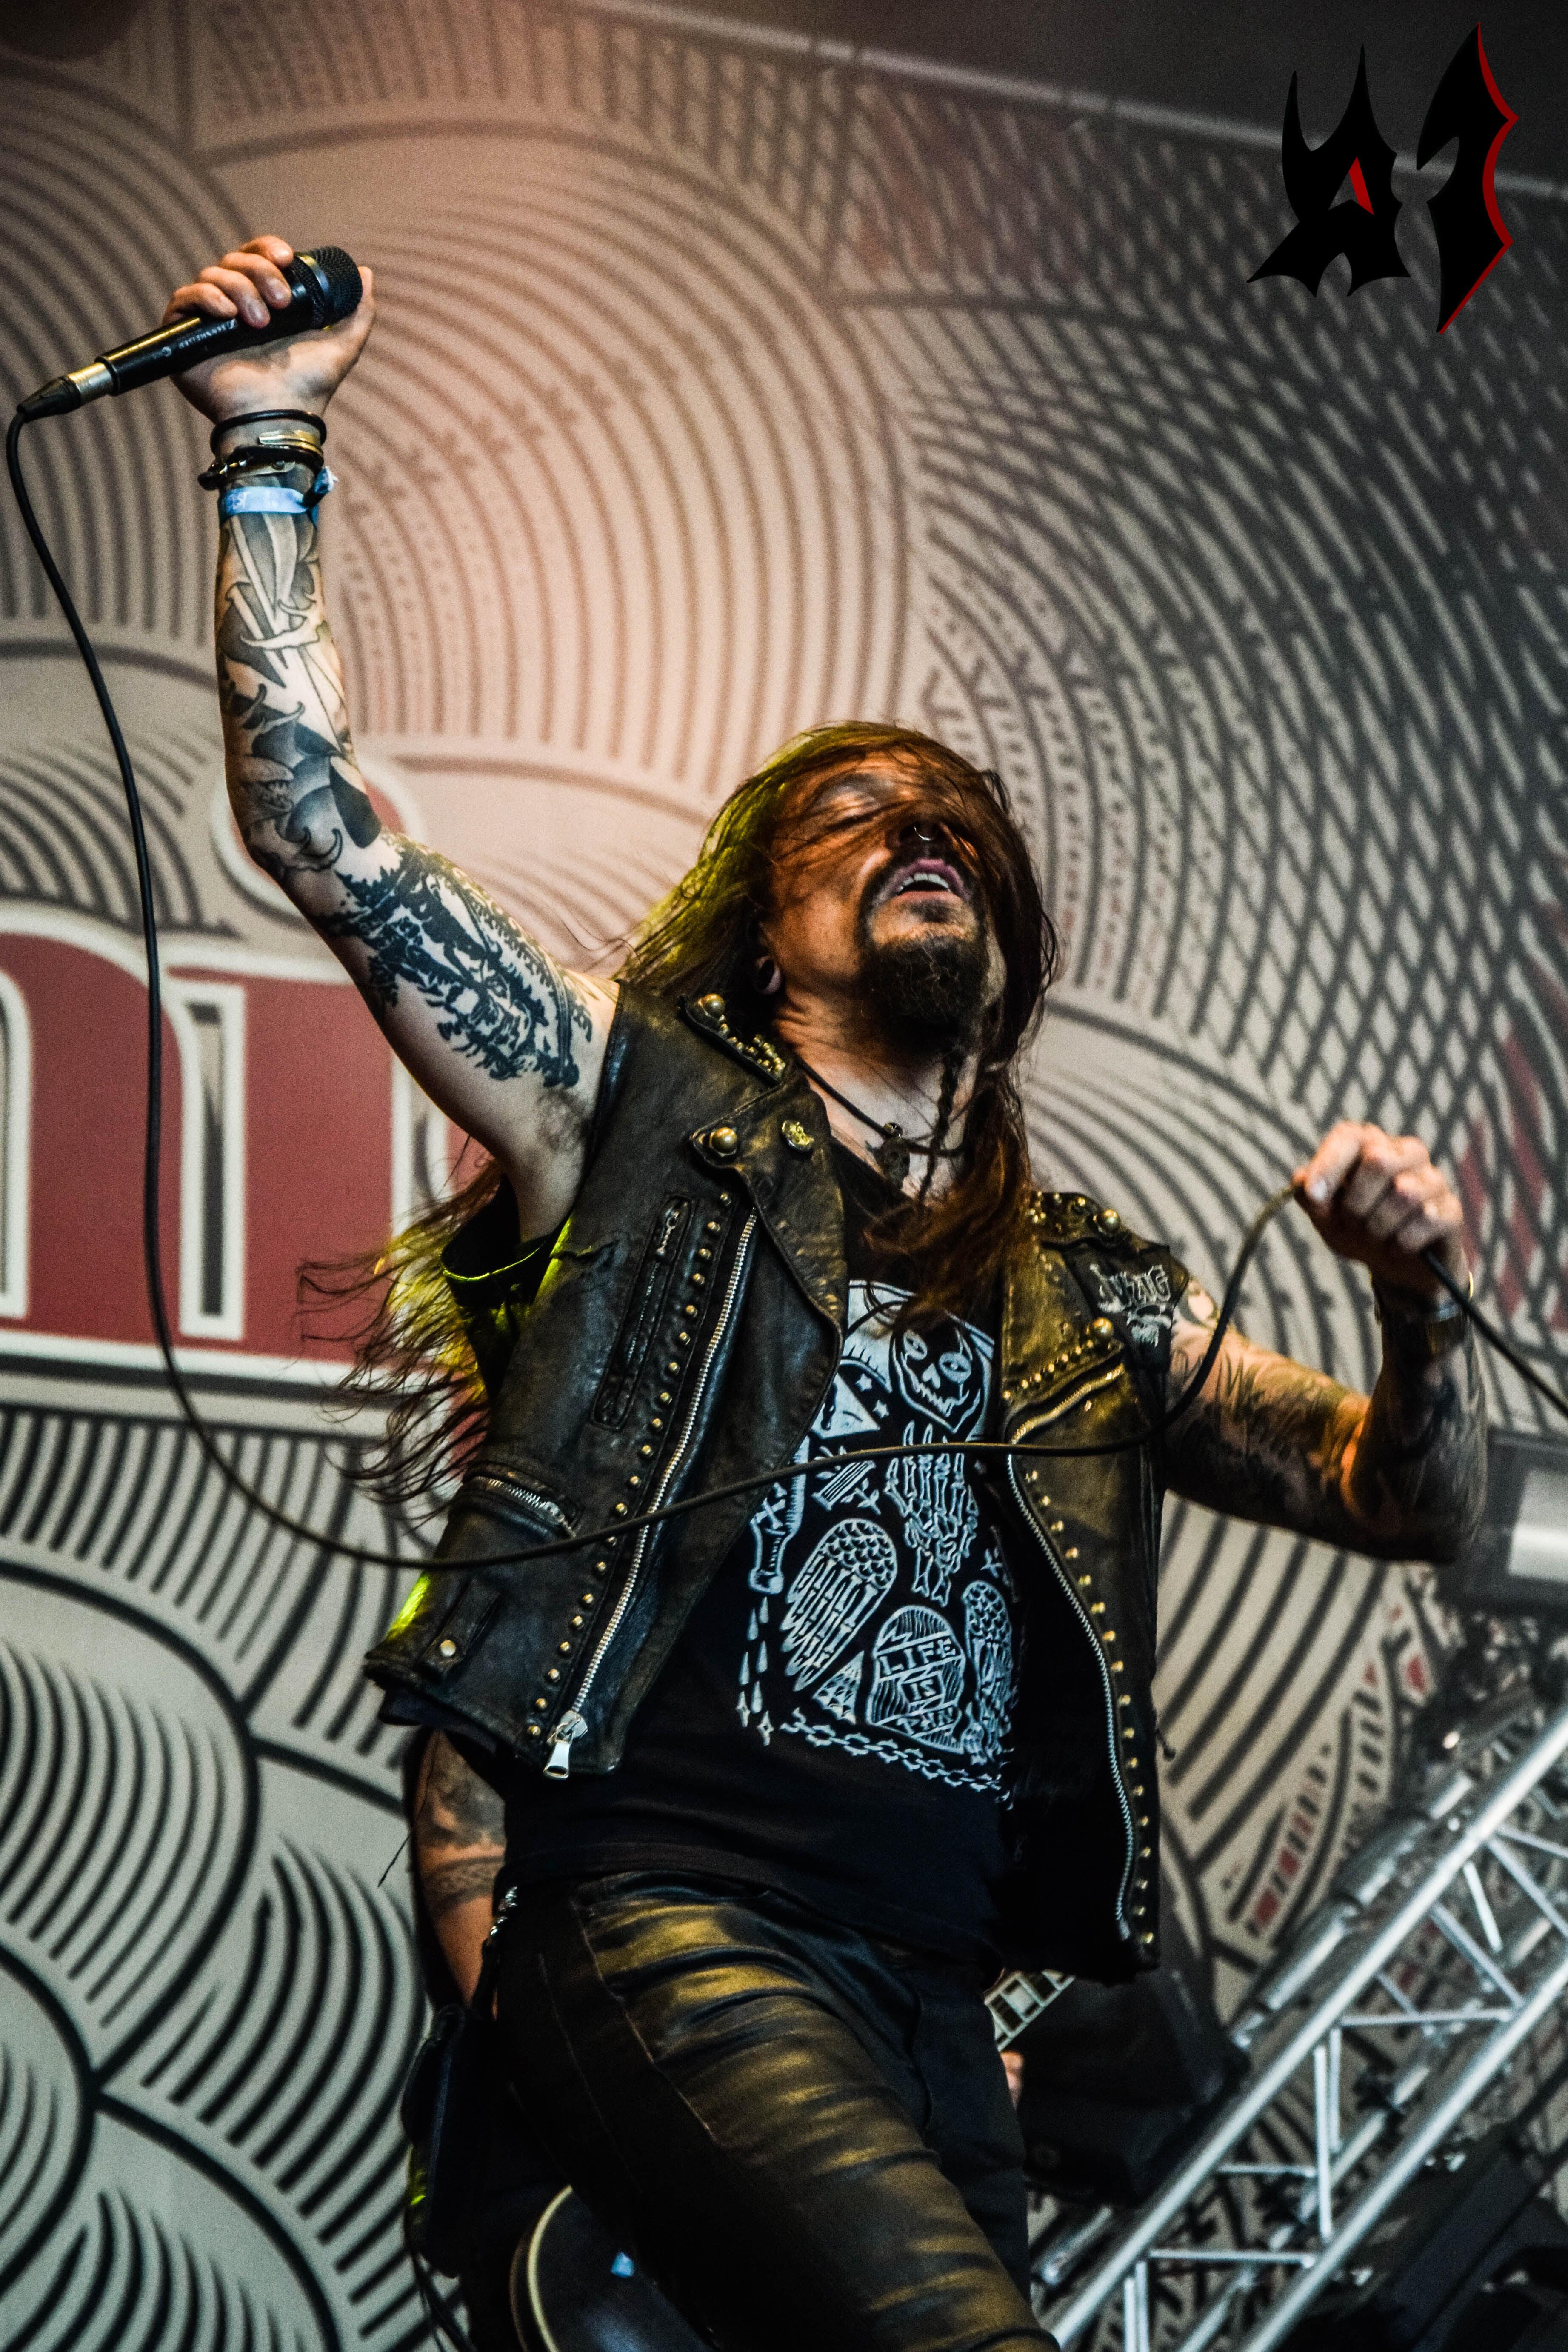 Hellfest 2018 – Day 3 - Amorphis 5